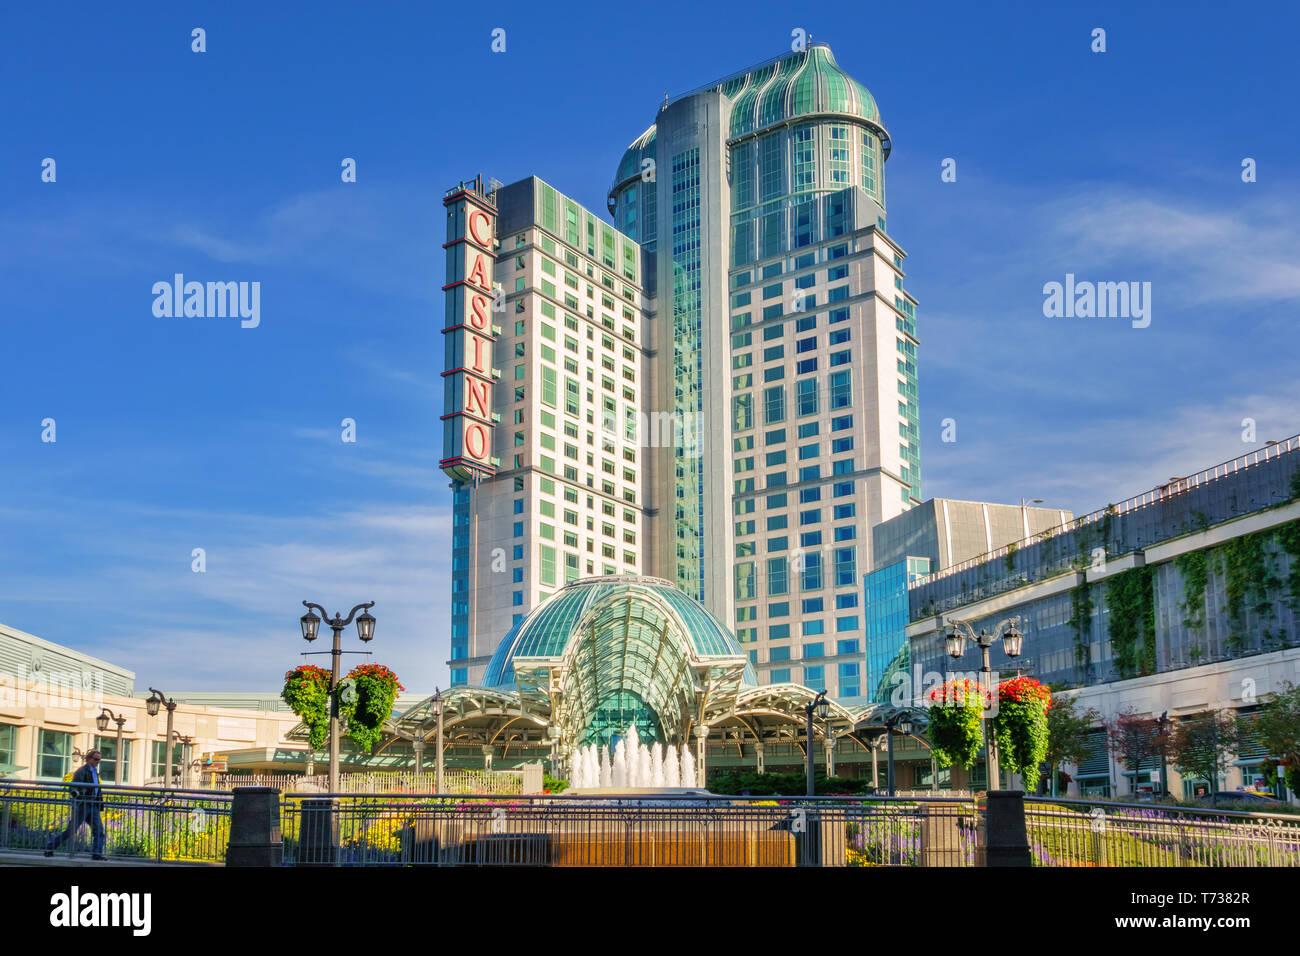 Fallsview Casino And Hotel In Downtown Niagara Falls Ontario